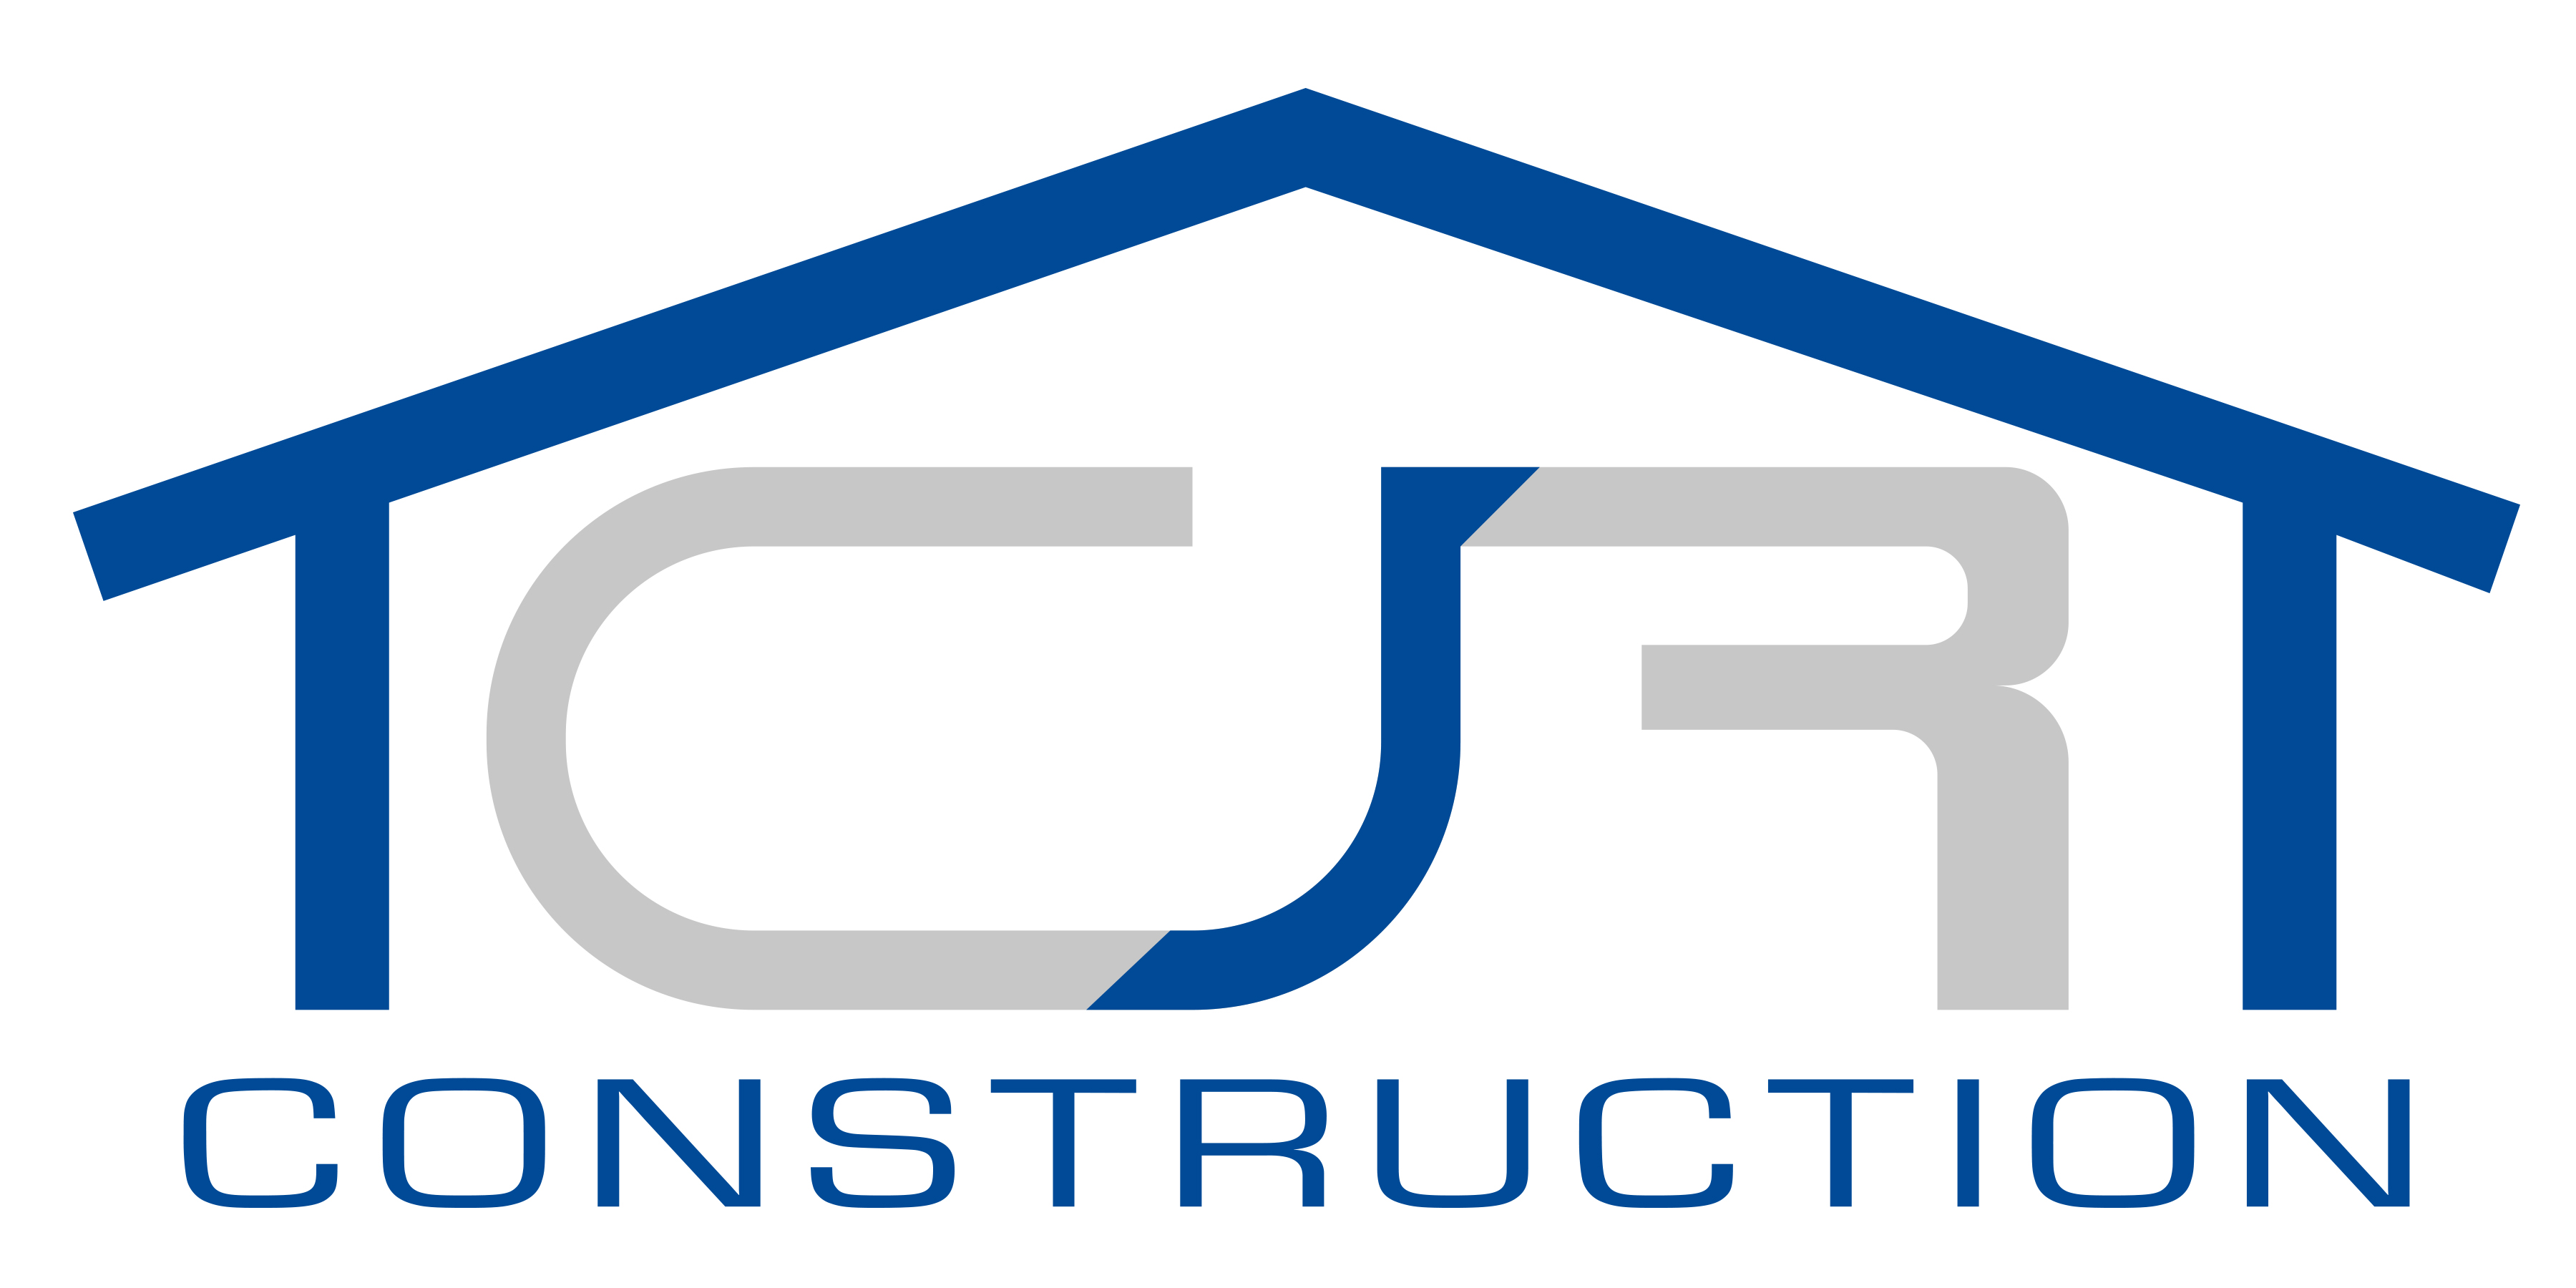 Cjr logo 5 letterhead